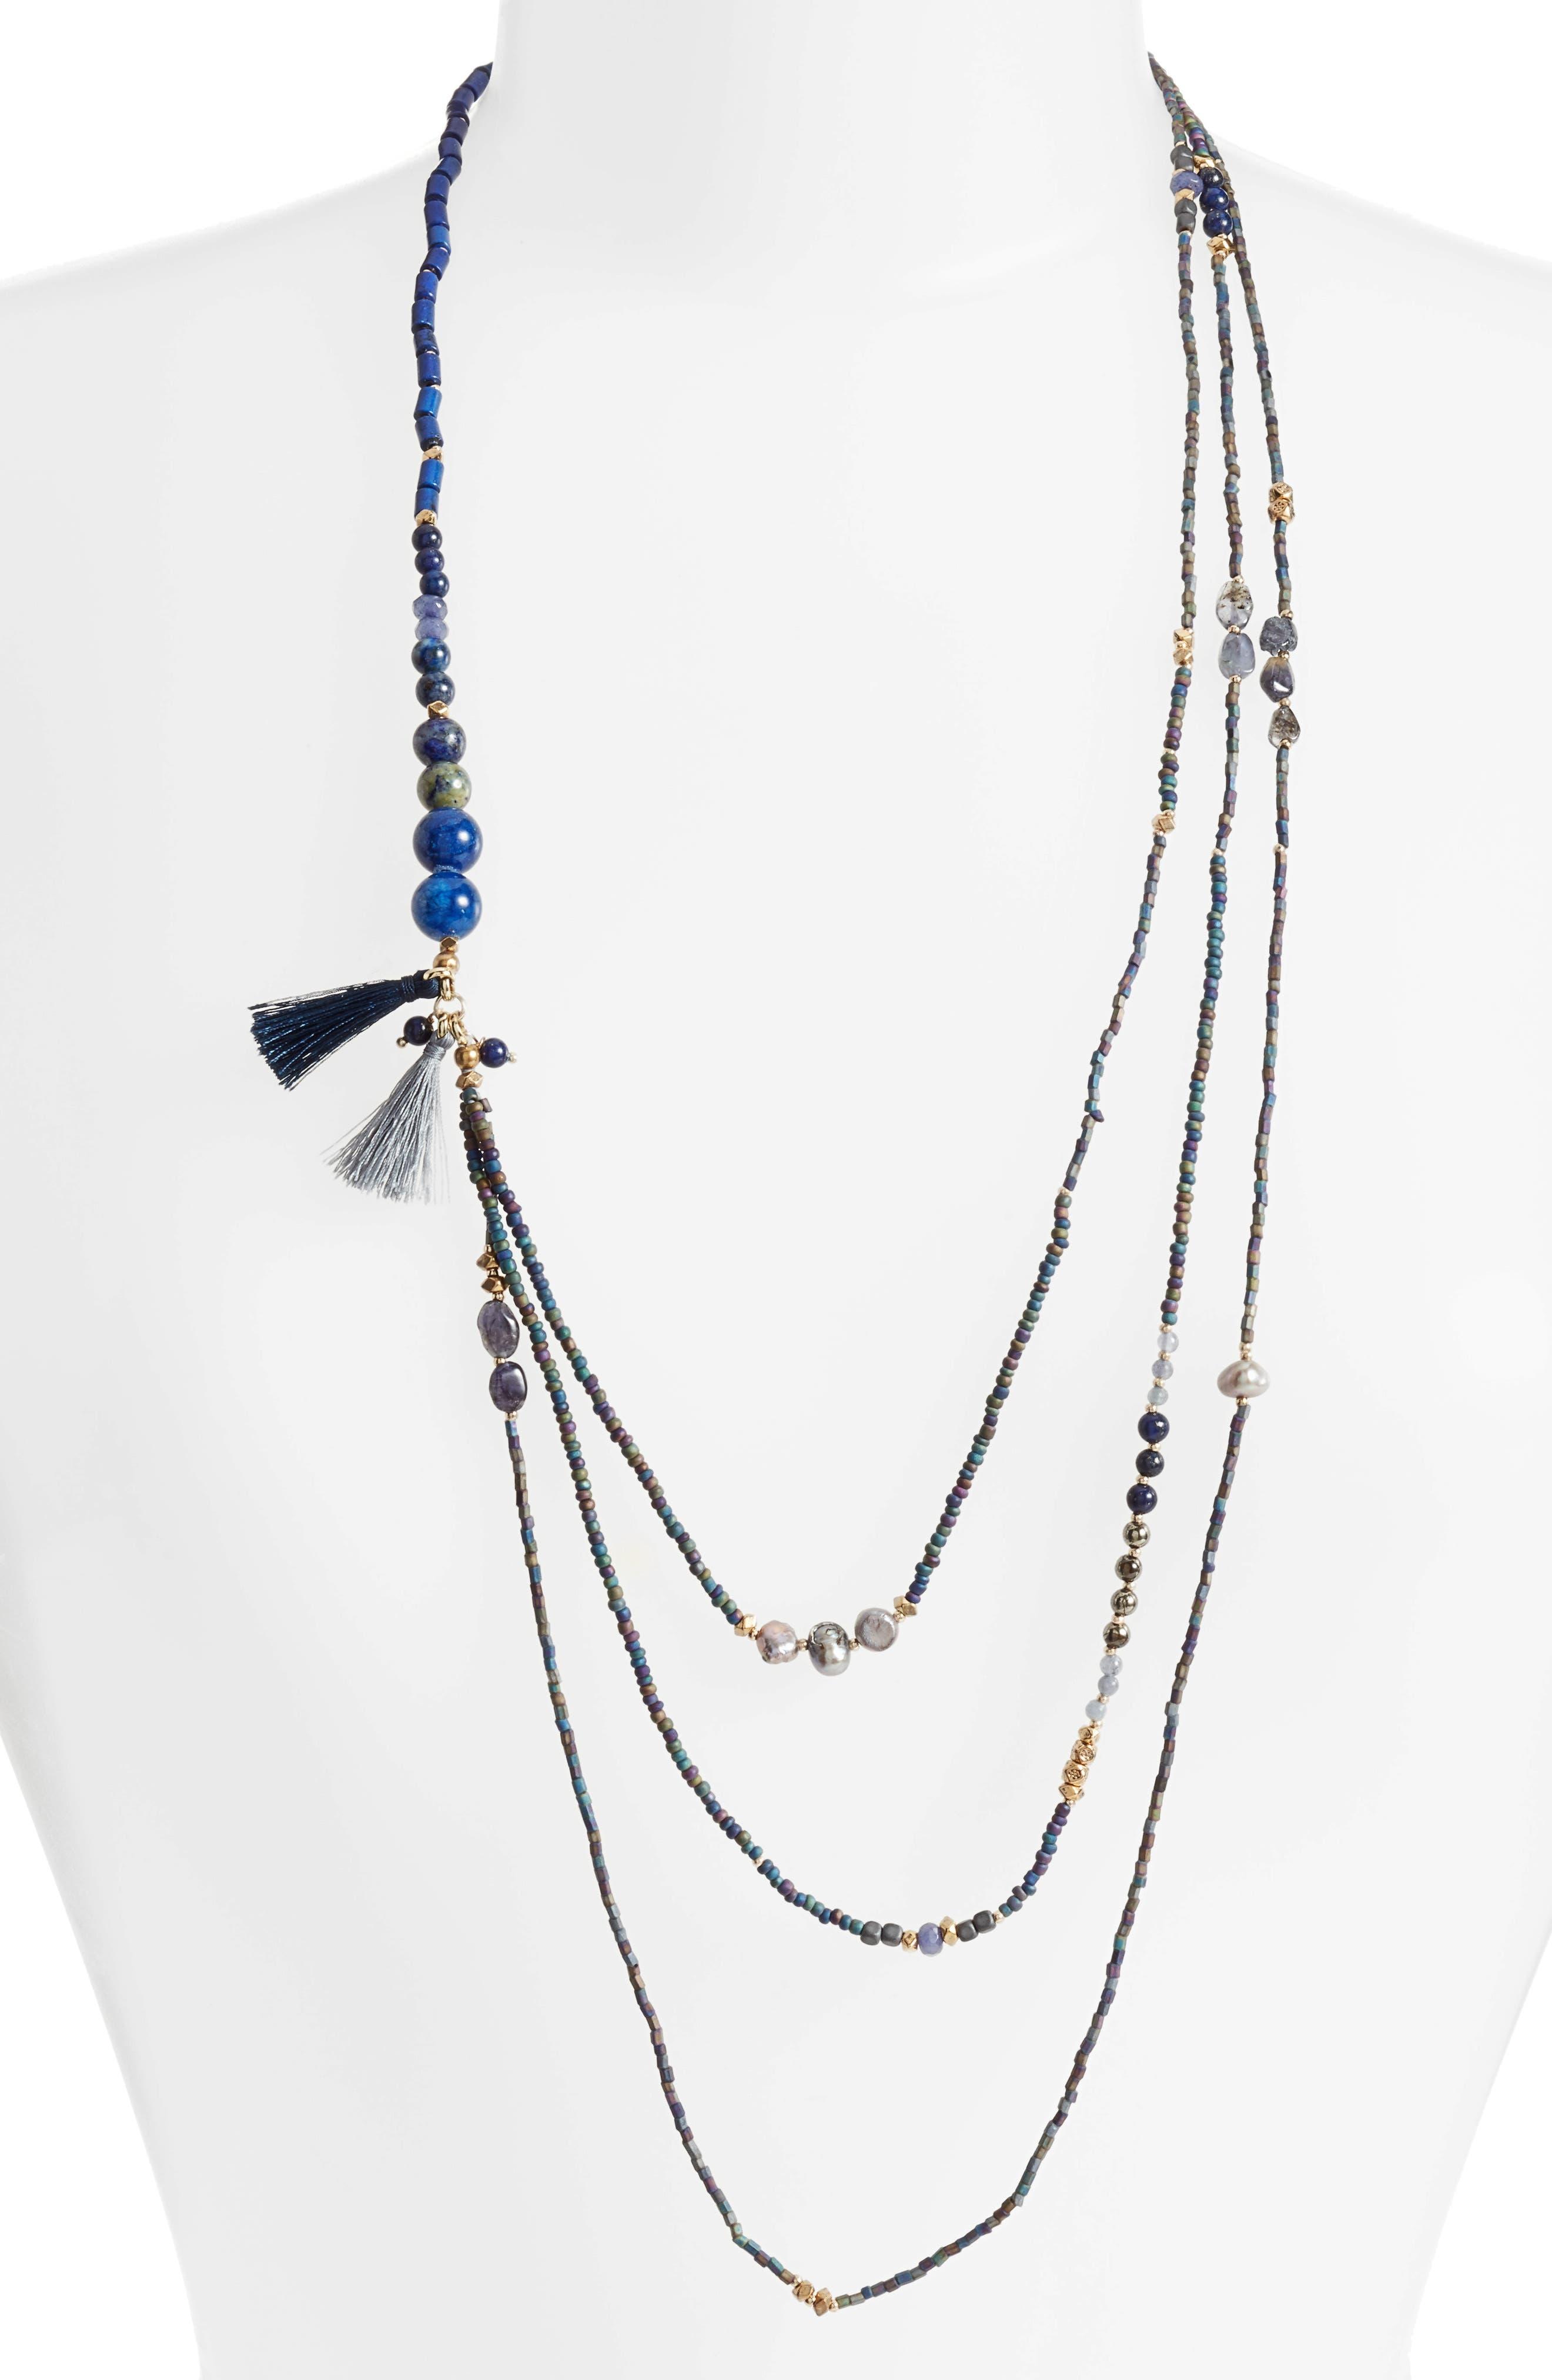 Konia Multistrand Tassel Necklace,                         Main,                         color, Blue